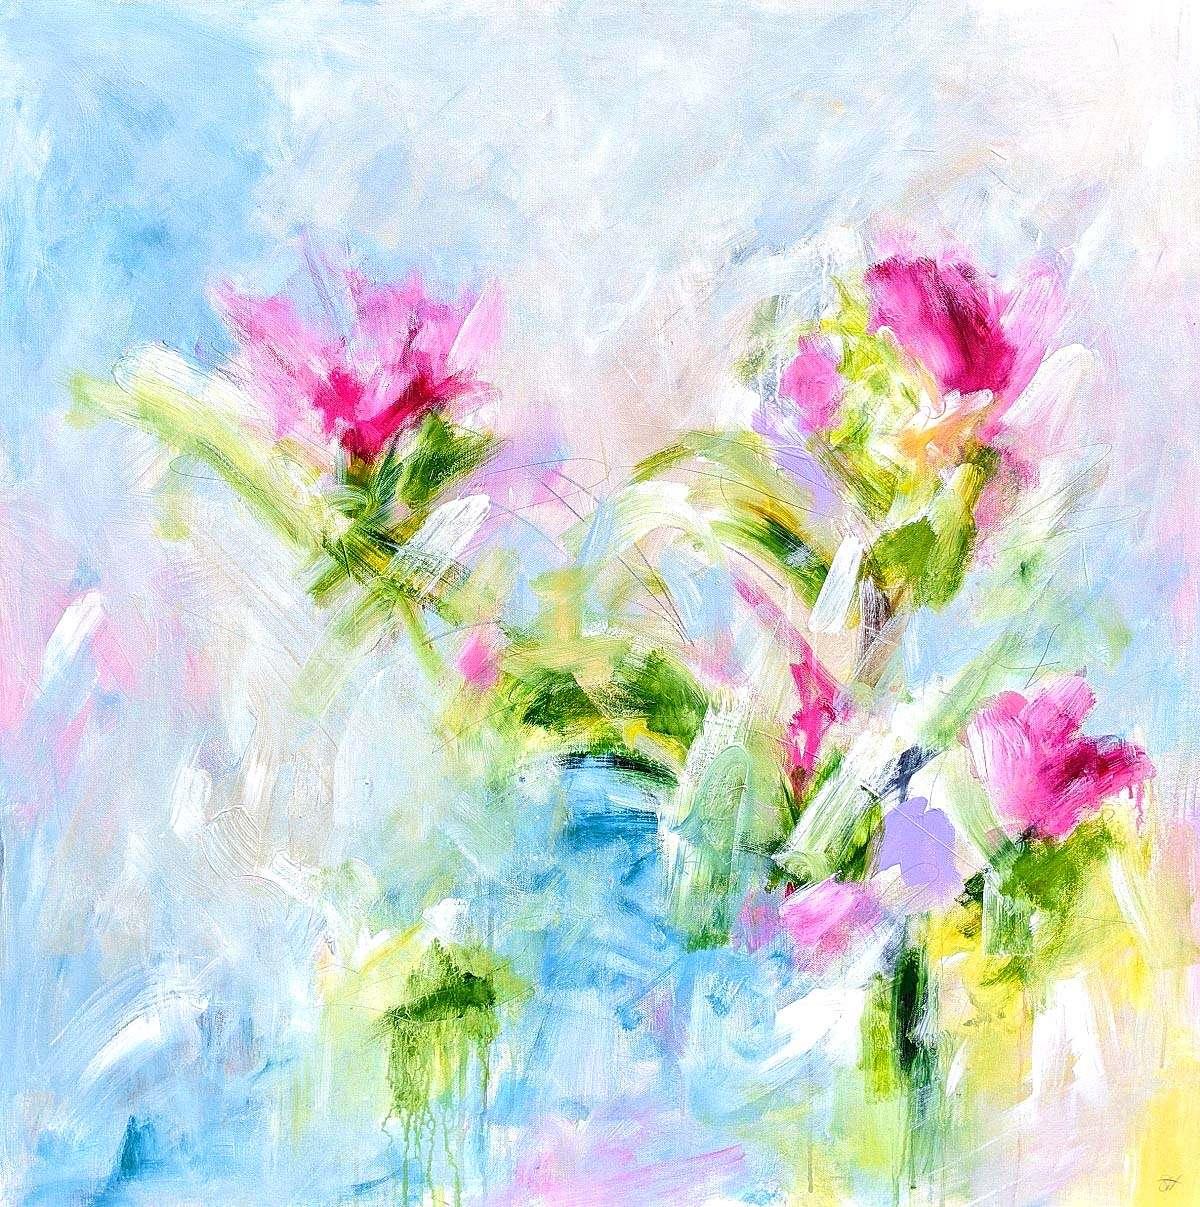 Shona Harcus, 'A Little Moment of Peace', acrylic on canvas